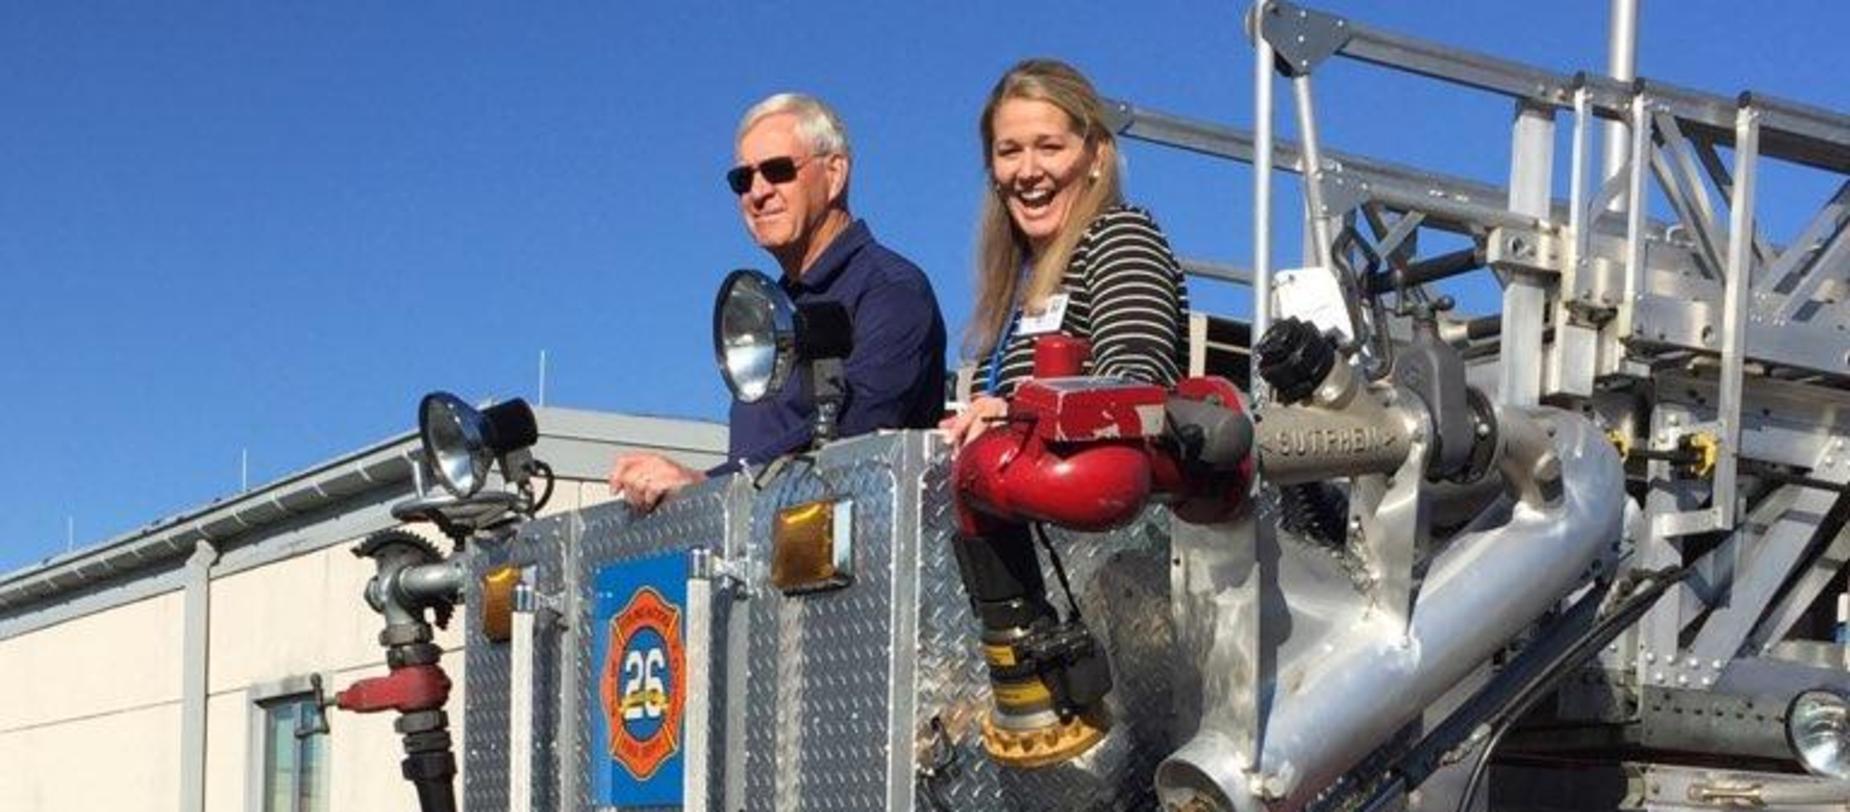 Principal in firetruck bucket